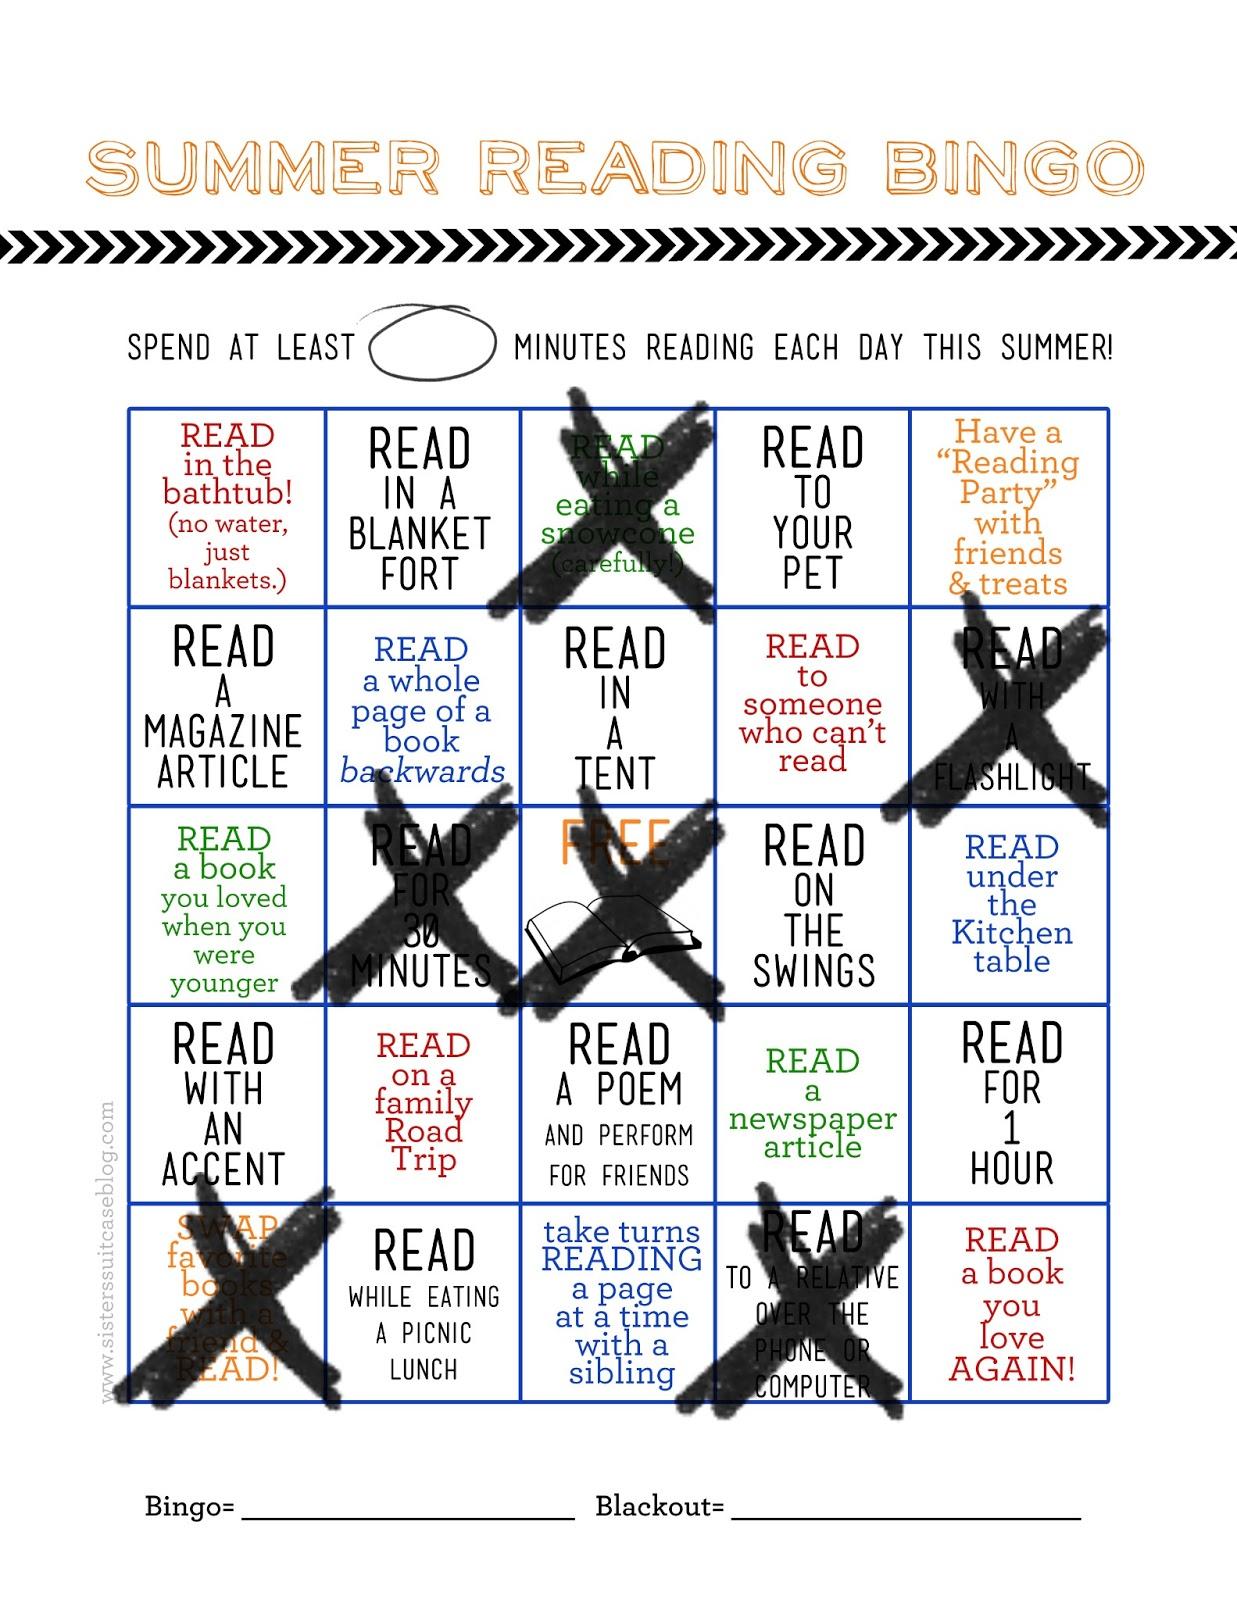 Summer Reading Bingo Card Printable Blog Hop